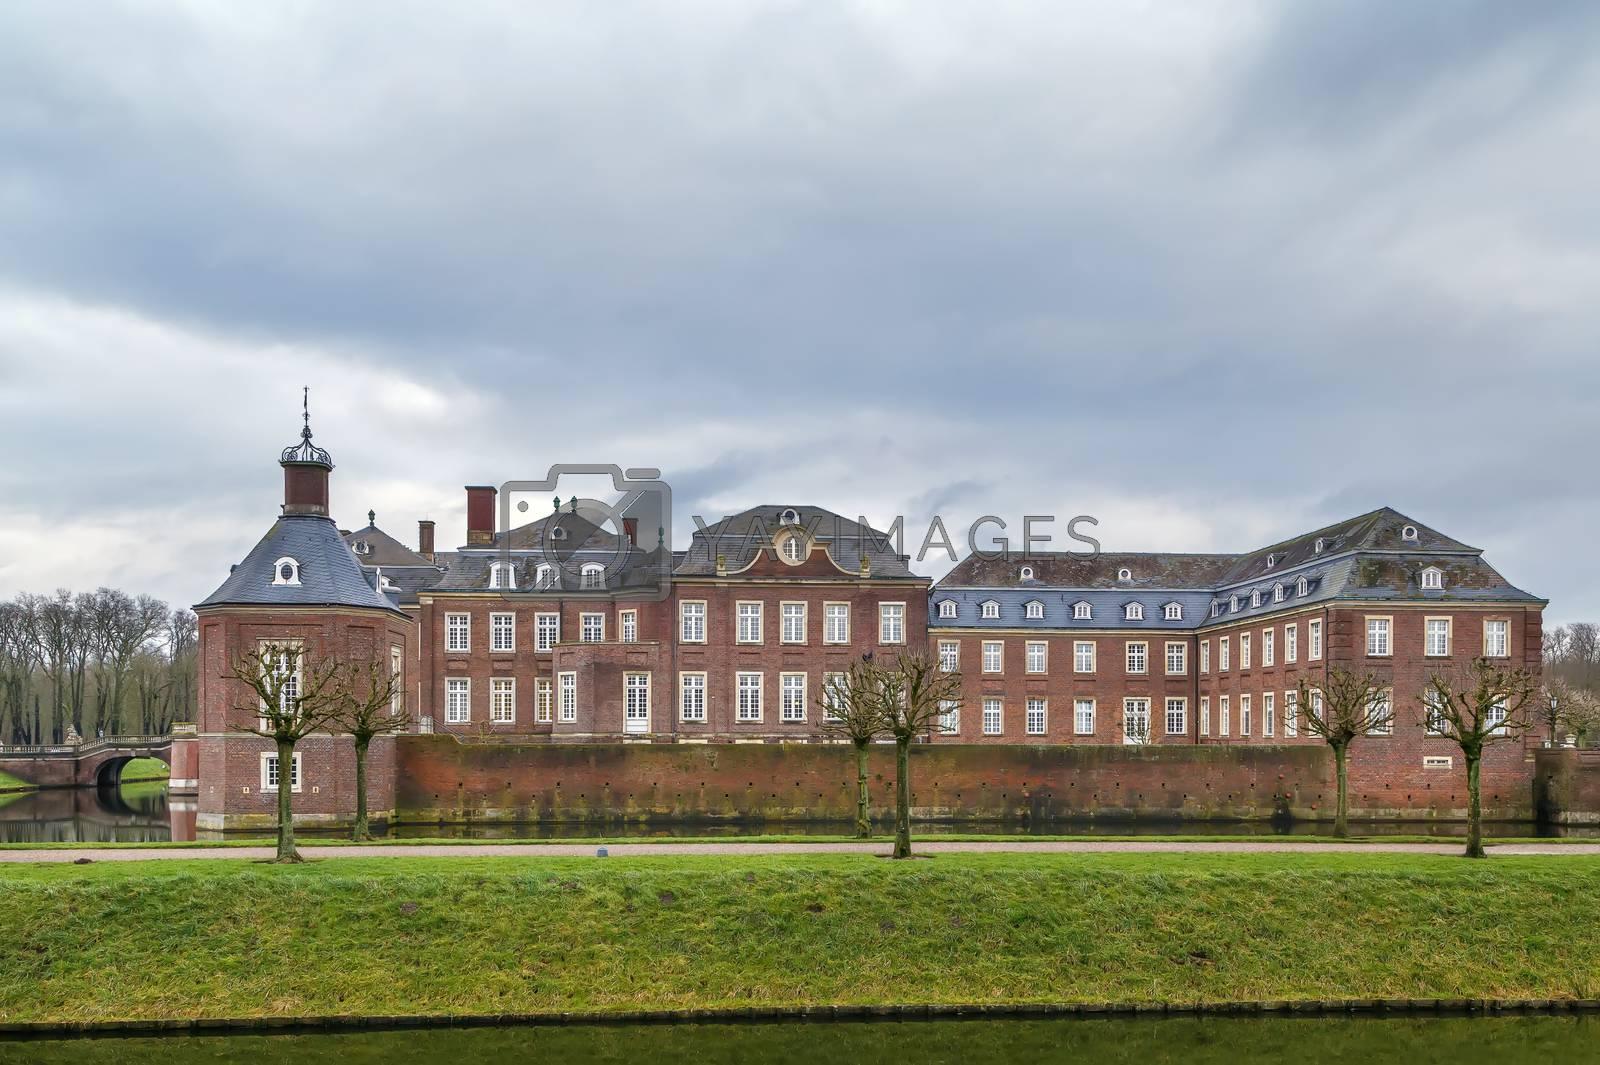 Royalty free image of Nordkirchen palace, Germany by borisb17